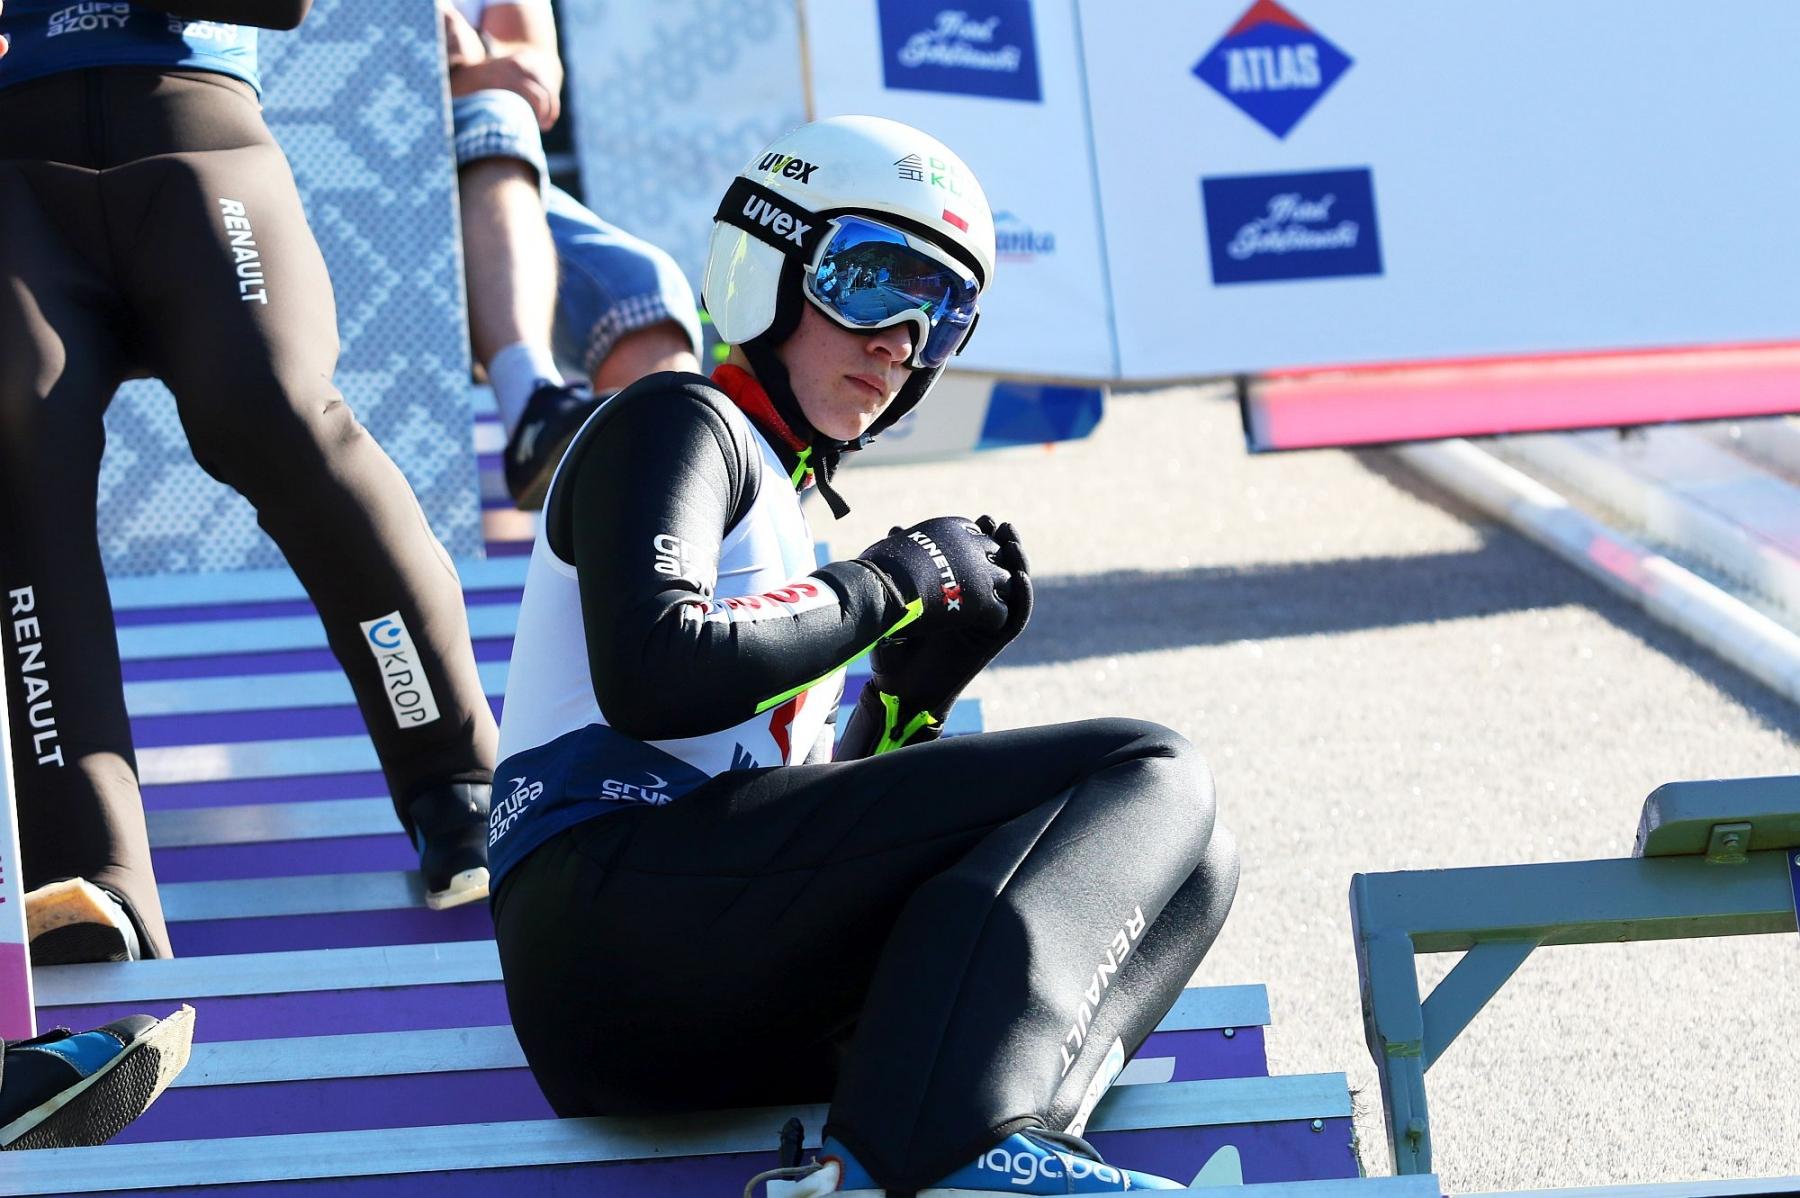 LGP Wisla 2020 treningi 9 - FIS Cup Oberhof: Moerth wygrywa konkurs, Ortner klasyfikację generalną